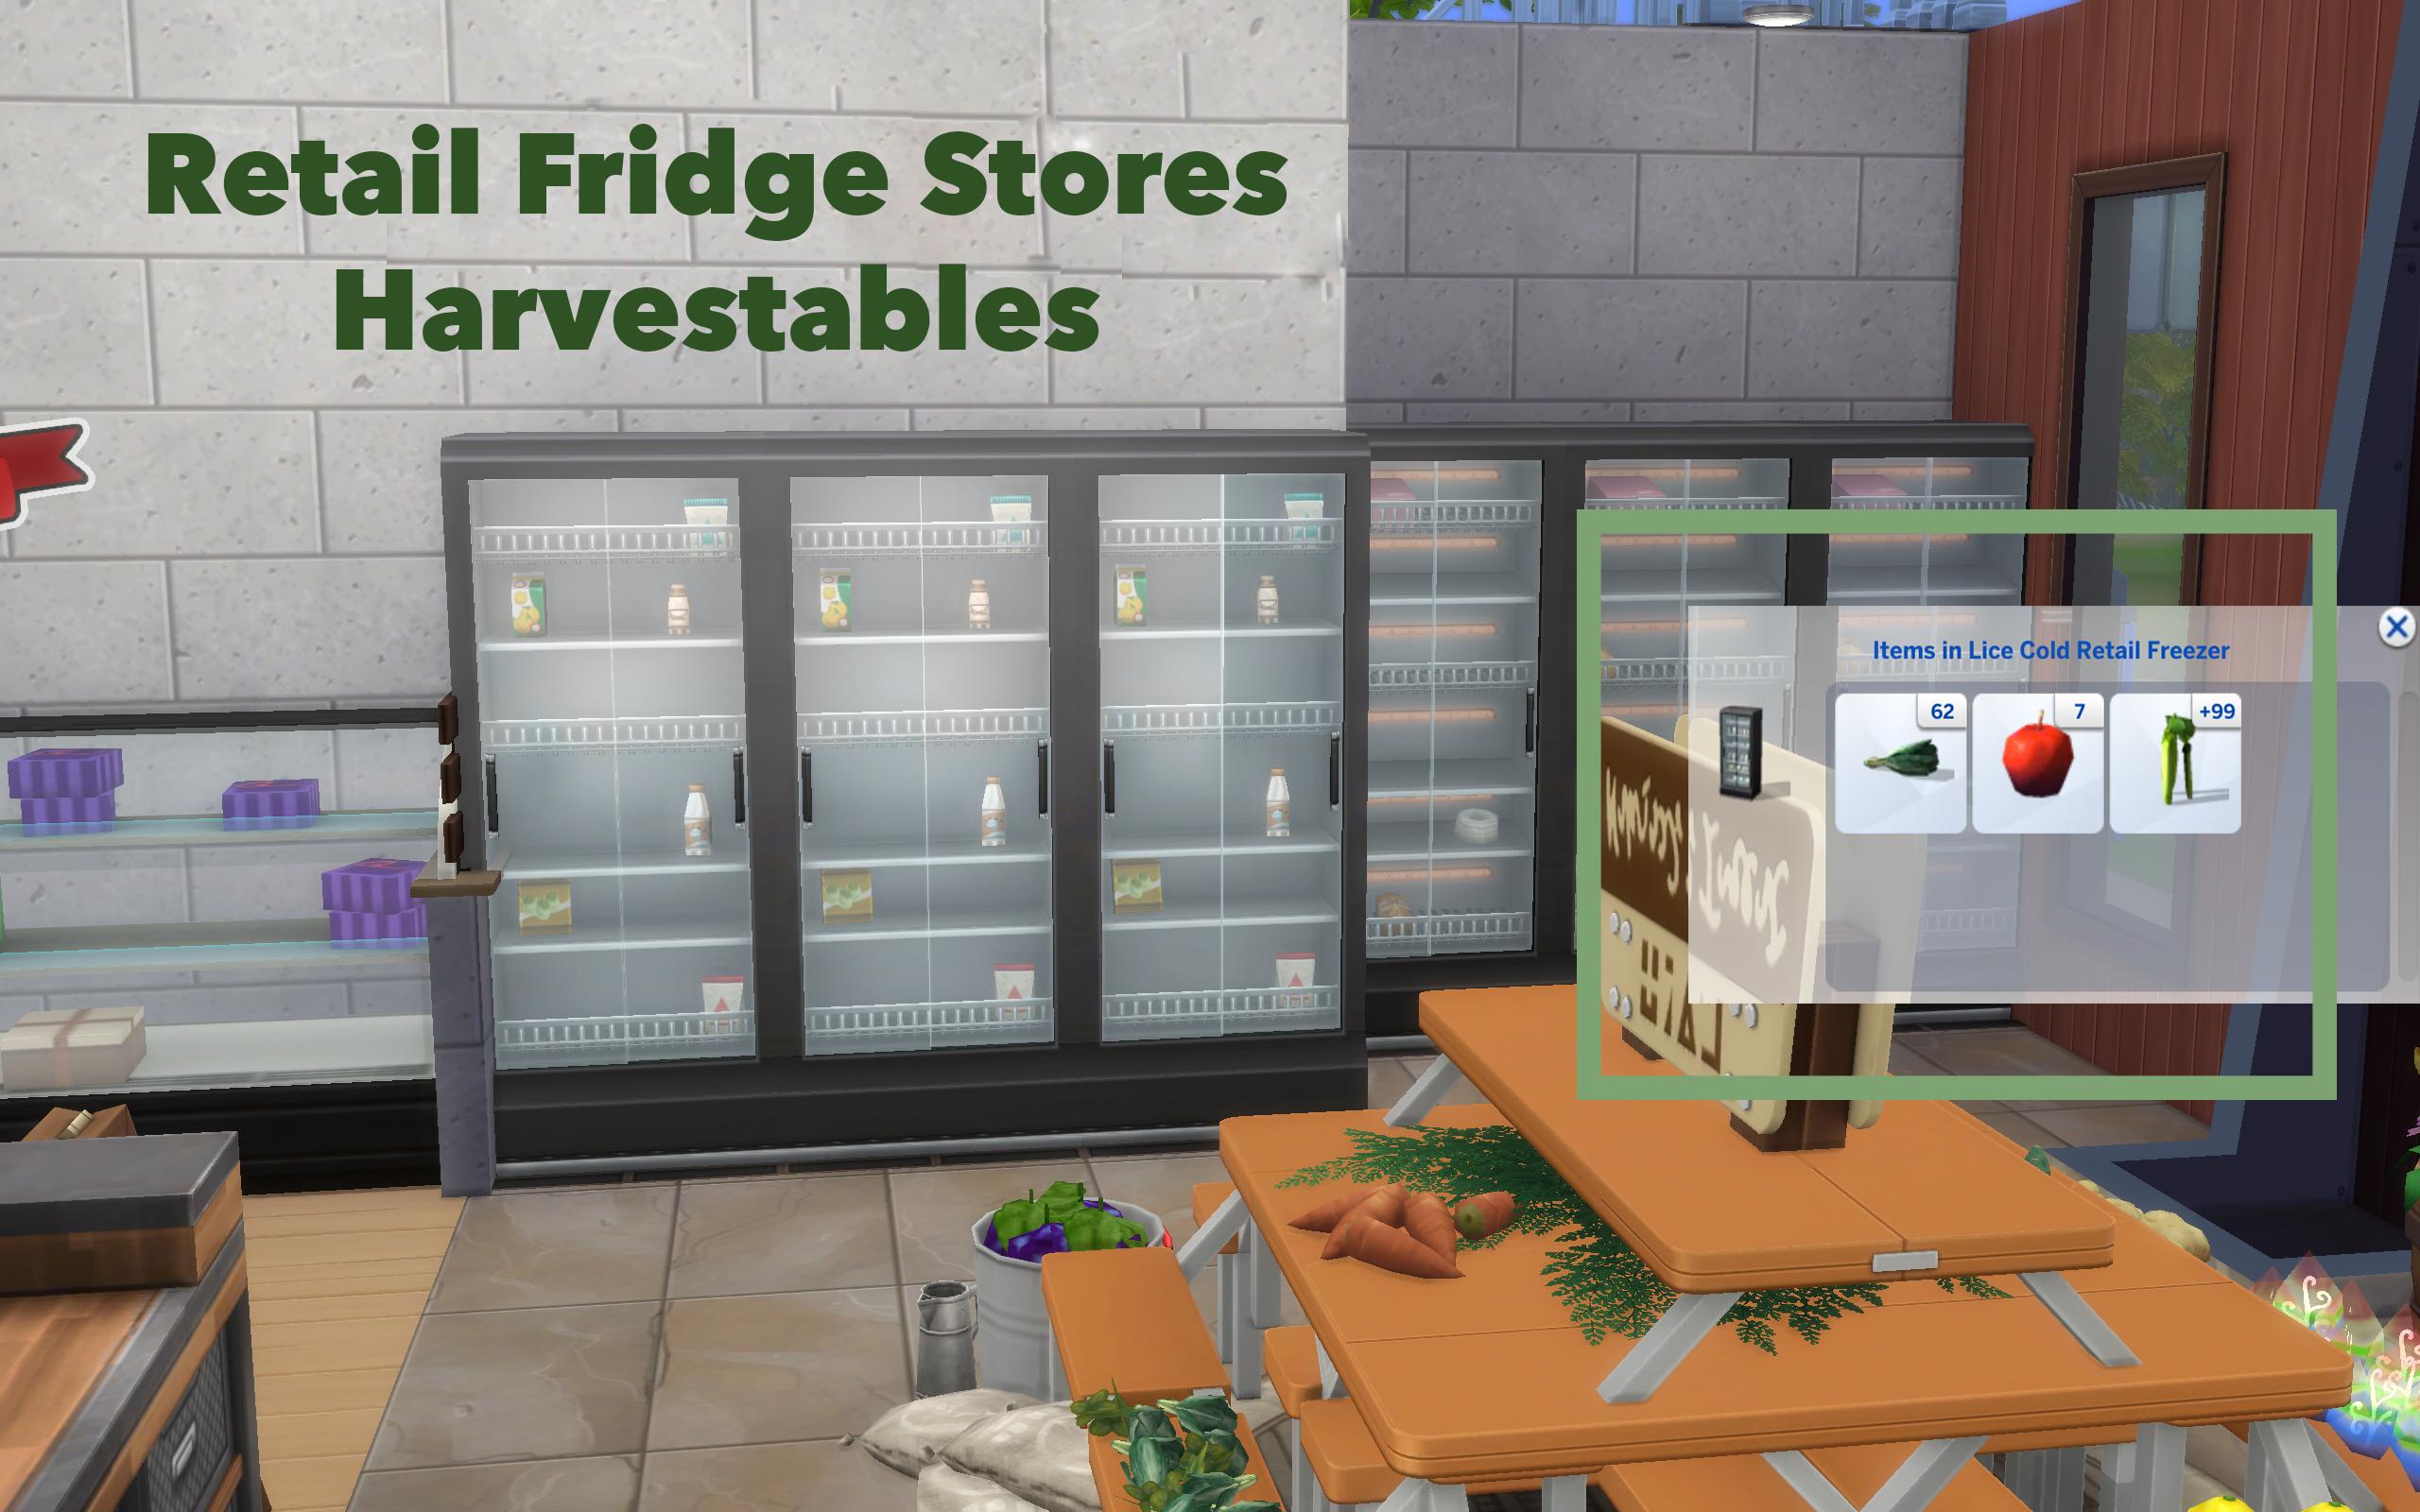 Mod The Sims   Retail Fridge Holds Harvestables